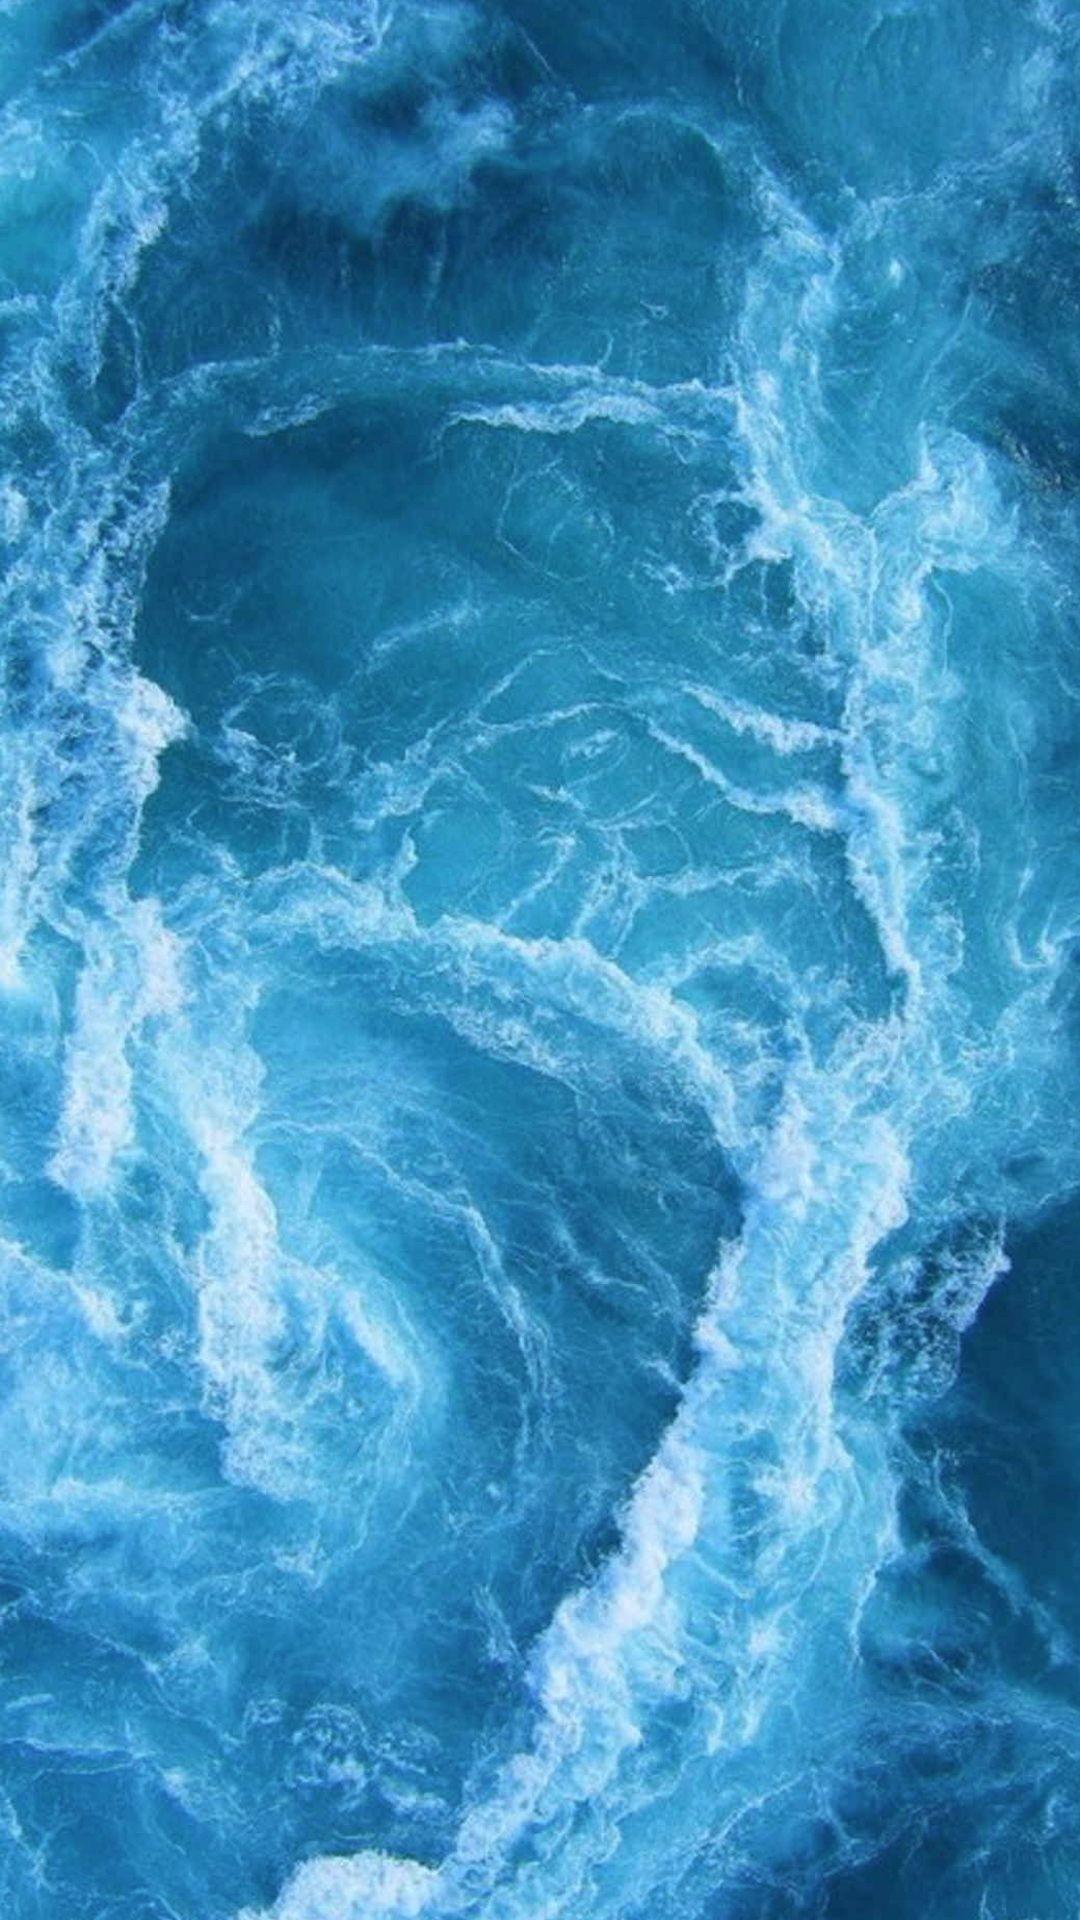 Ocean Water Blue Wallpapers Wallpaper Cave